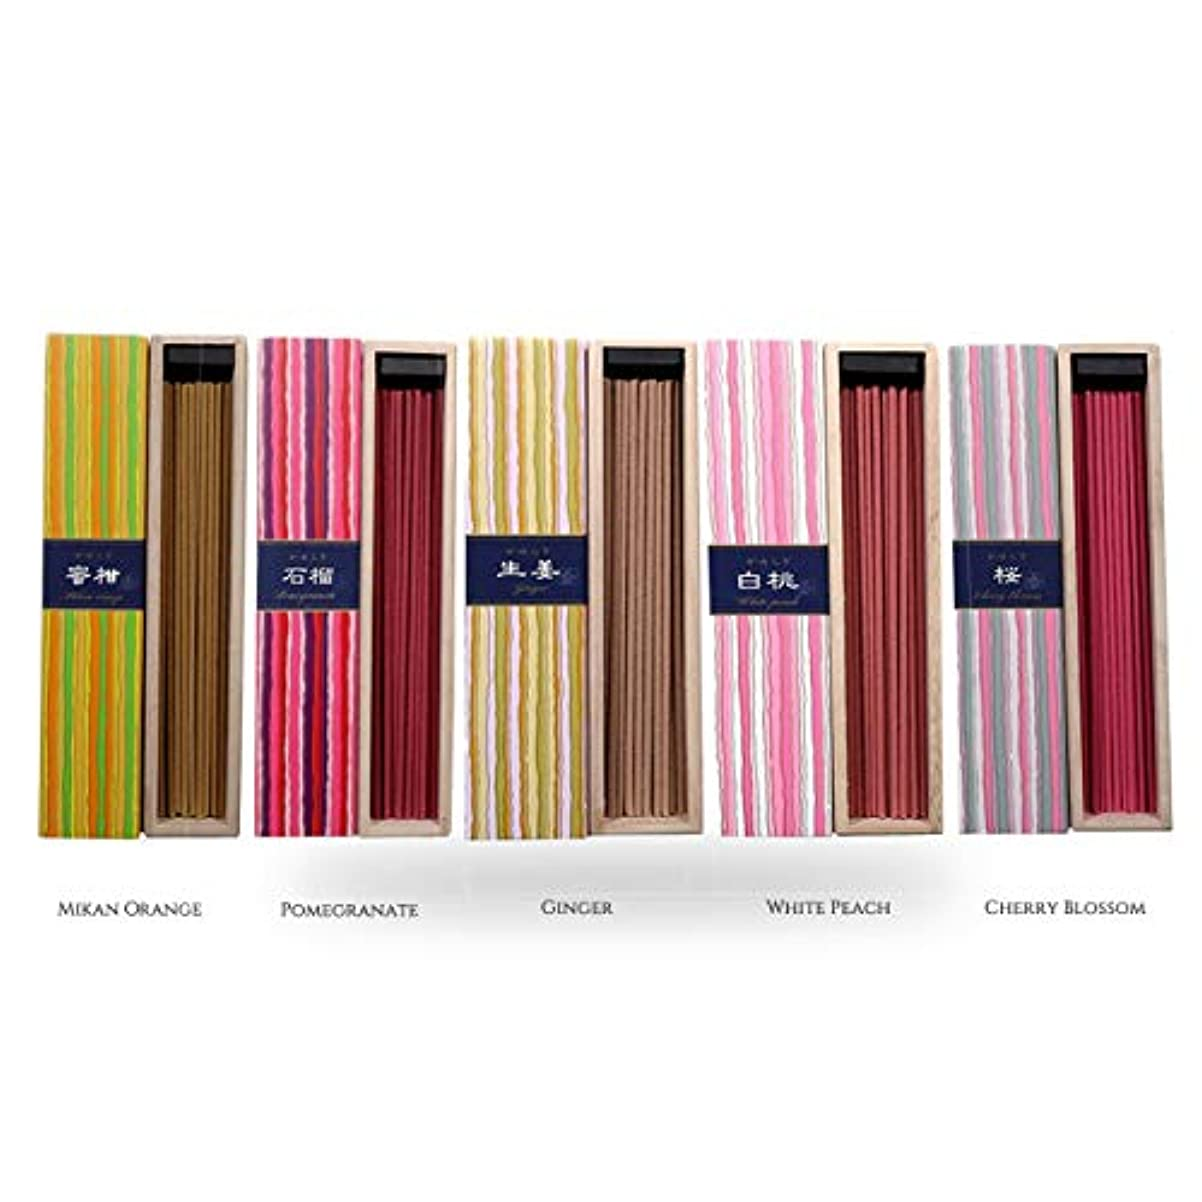 iTakara 日本香コレクション   日本の庭 40x5   リラックス、瞑想、祈り、読書、ヨガ用フローラルとアロマの木の香り   クリーン燃焼、ピュアな香り